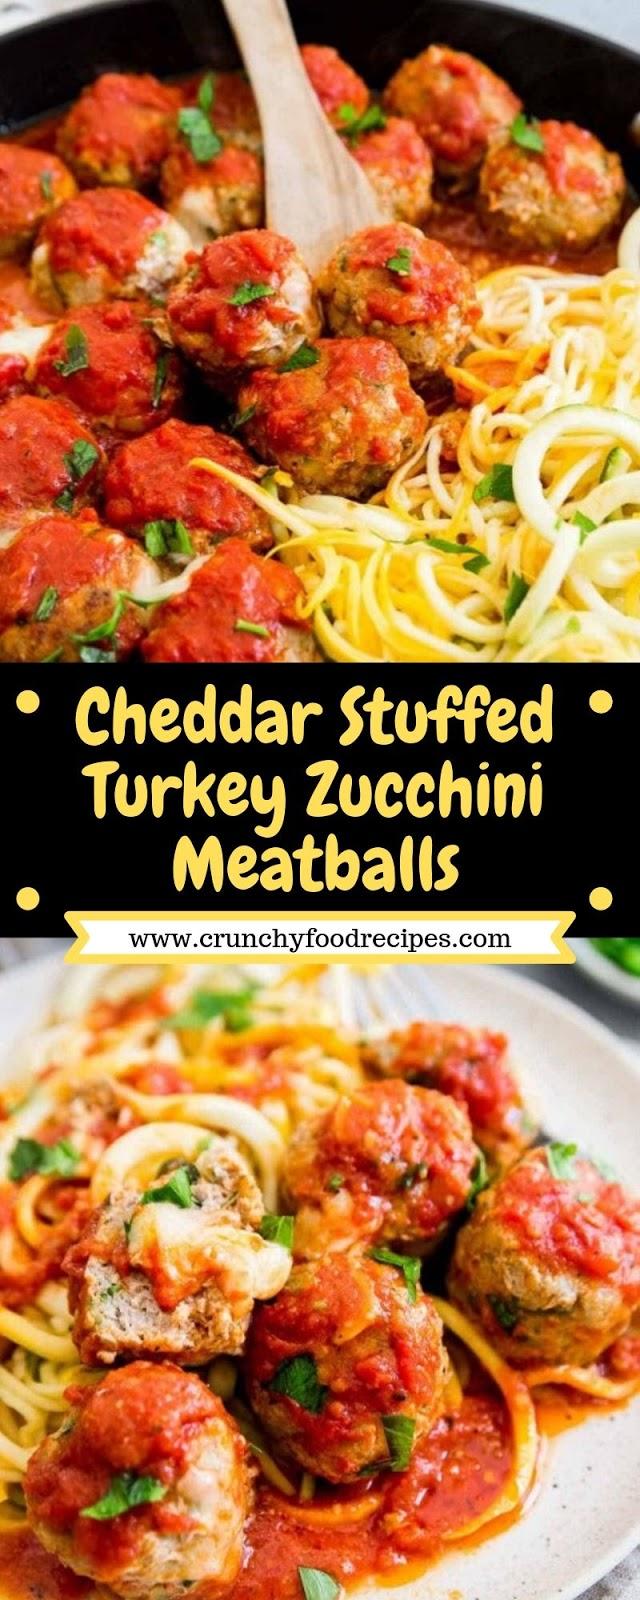 Cheddar Stuffed Turkey Zucchini Meatballs